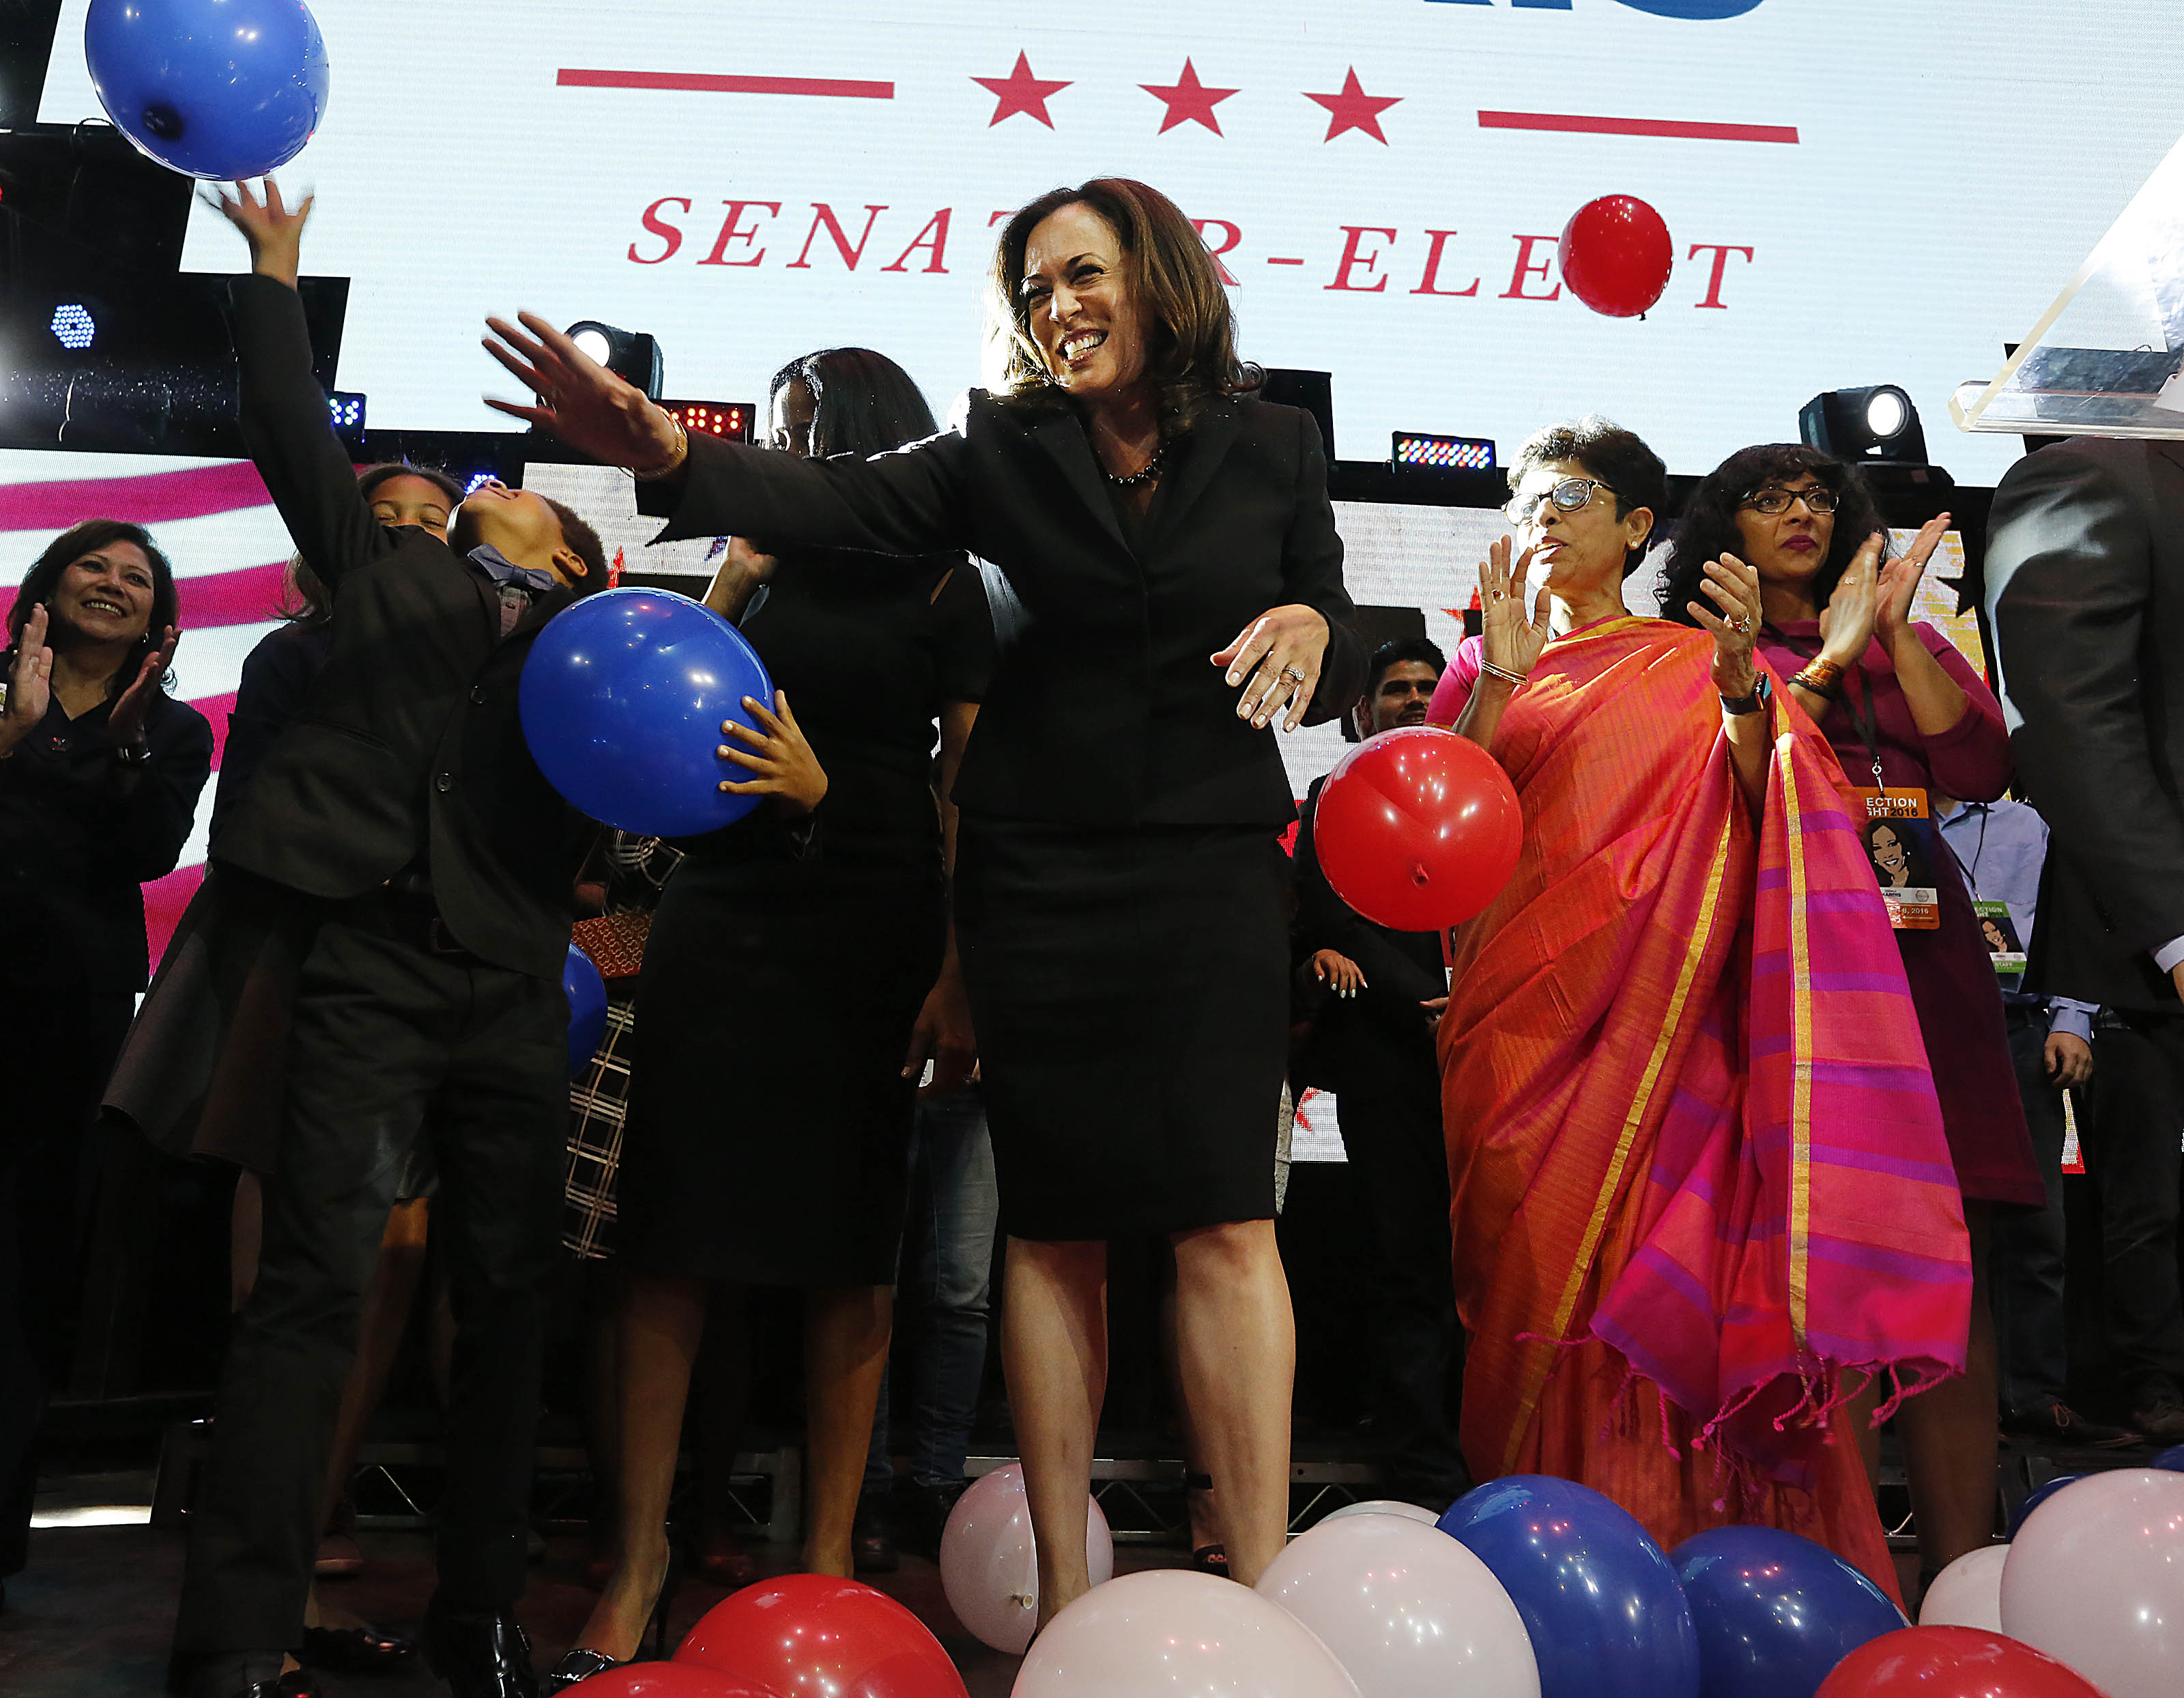 Election 2016 Tammy Duckworth Kamala Harris Made History Time